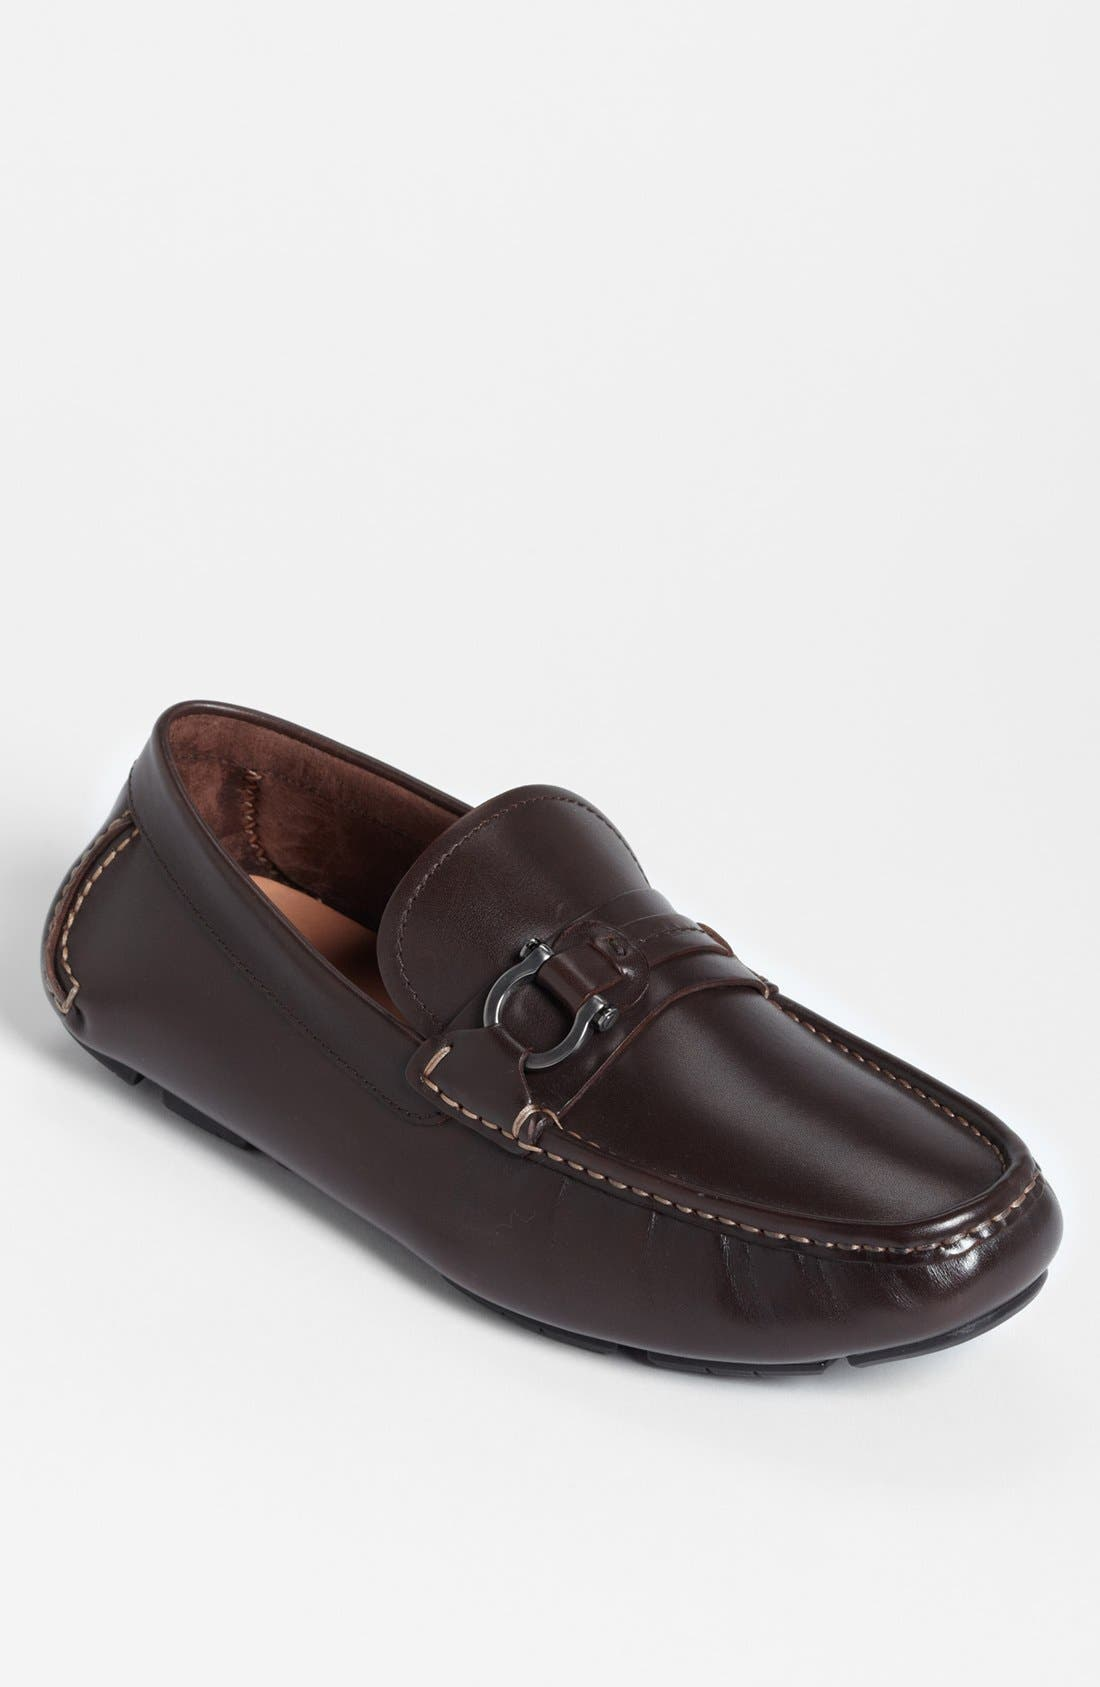 Alternate Image 1 Selected - Salvatore Ferragamo 'Sabatino' Driving Shoe